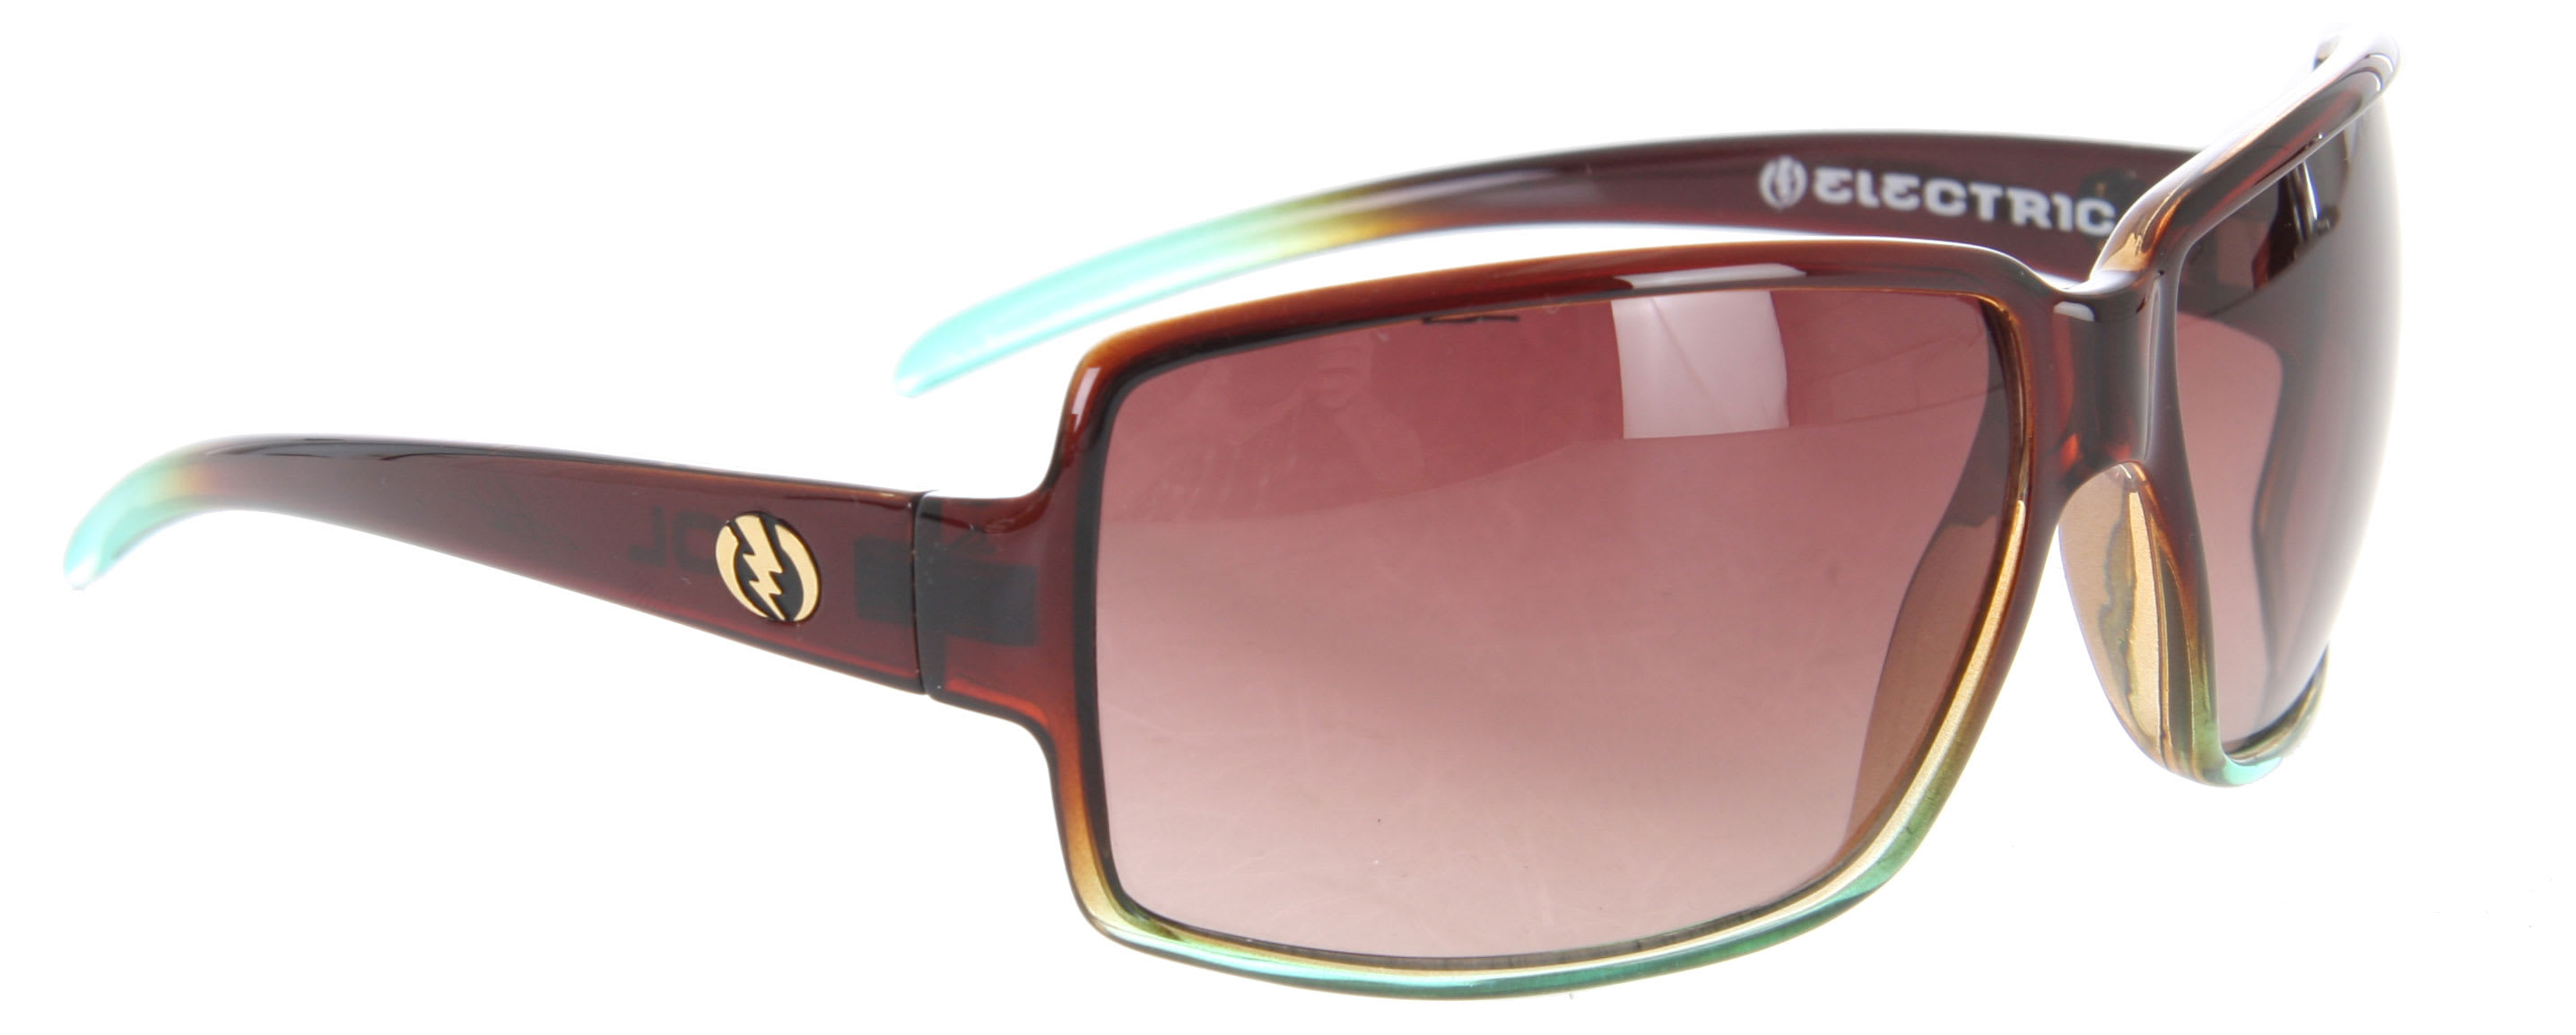 On Sale Electric Vol Sunglasses - Womens